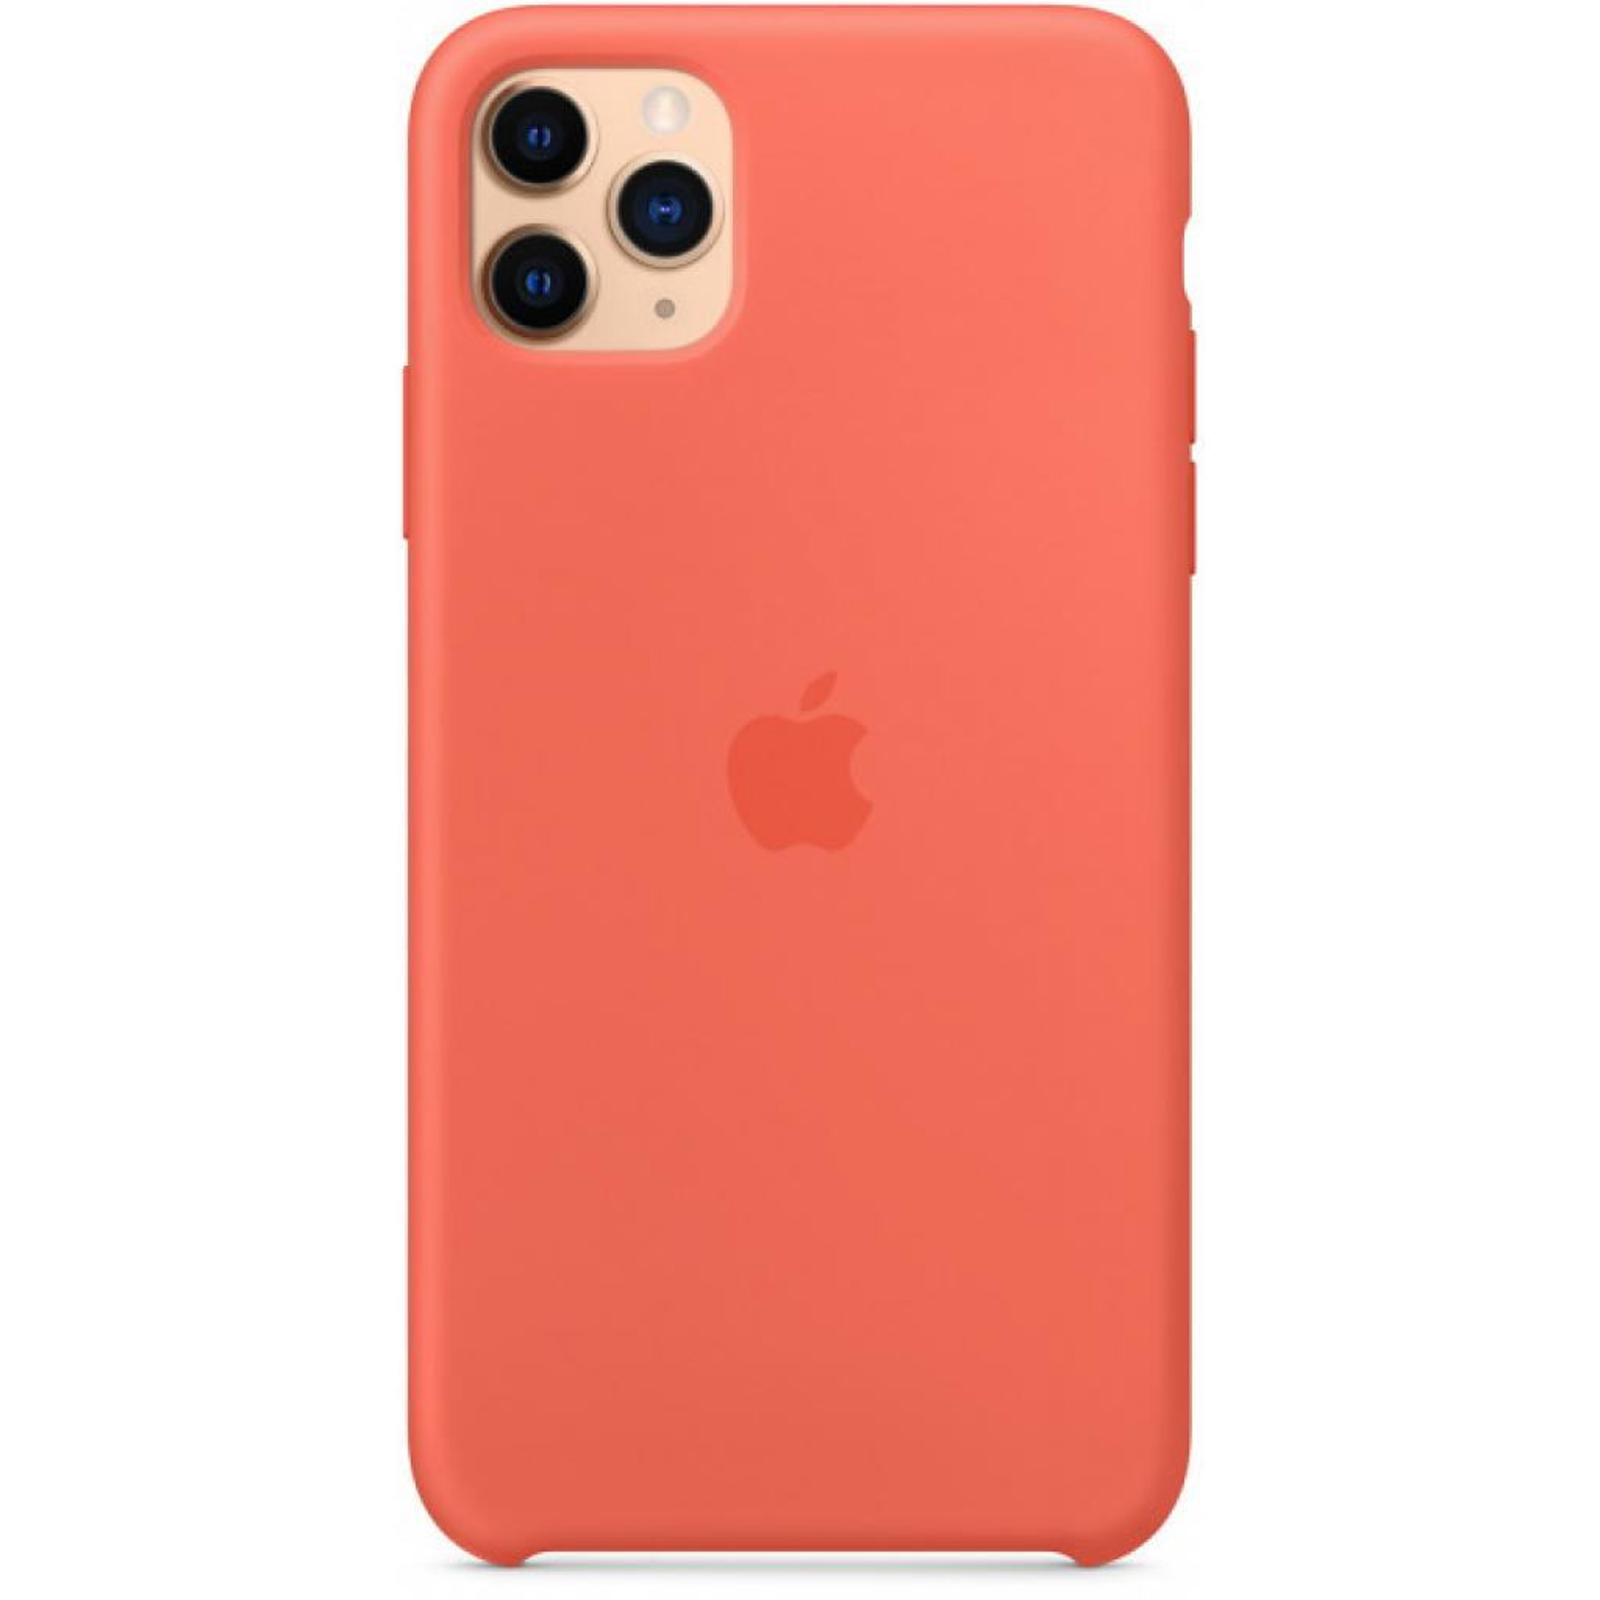 Чехол для моб. телефона Apple iPhone 11 Pro Max Silicone Case - Clementine (Orange) (MX022ZM/A) изображение 4